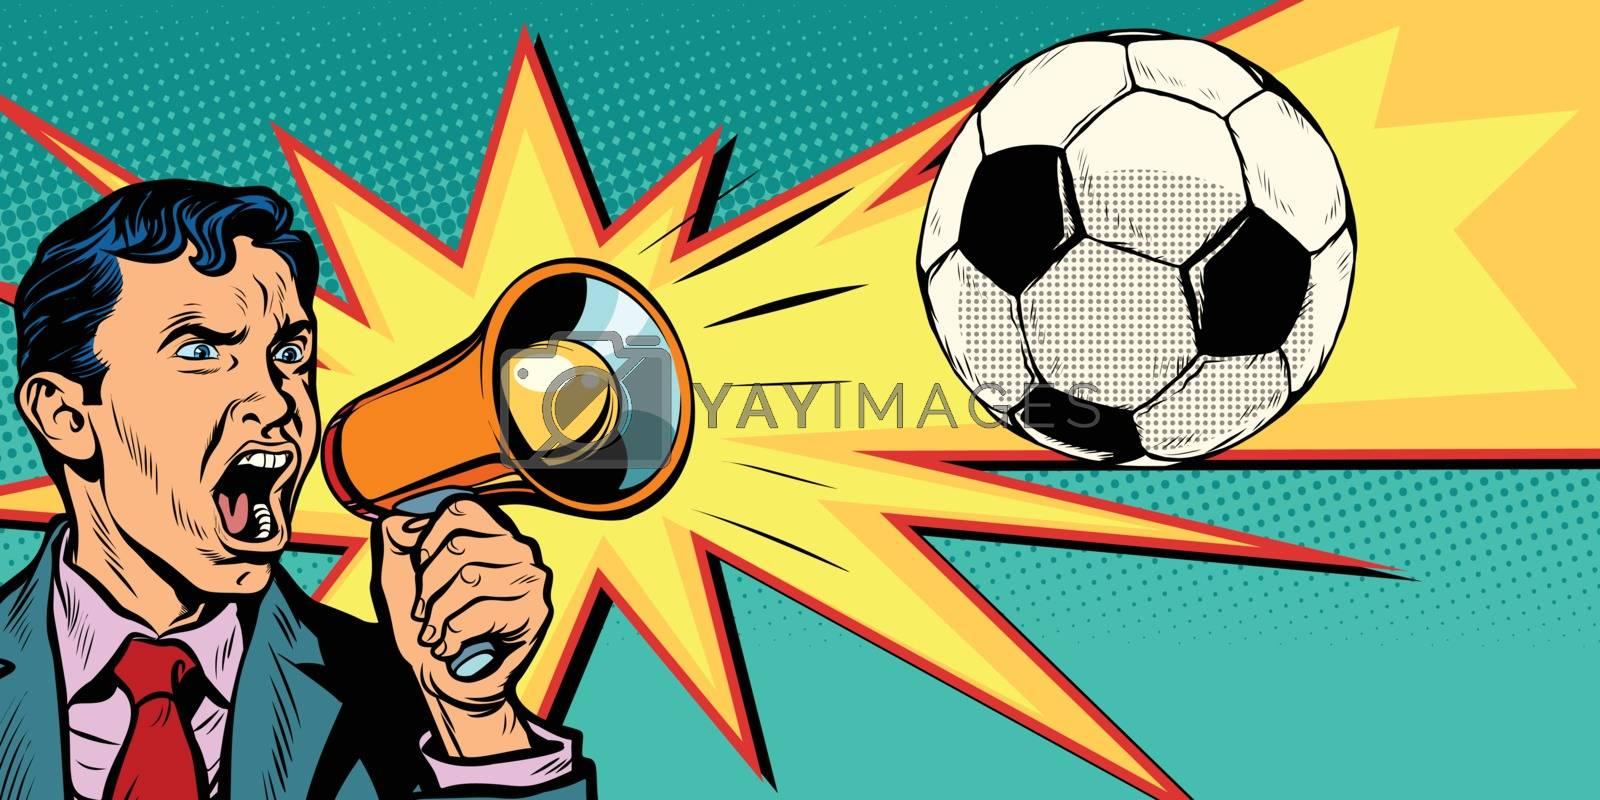 businessman with megaphone the fan of a football match. Pop art retro vector illustration comic cartoon kitsch drawing